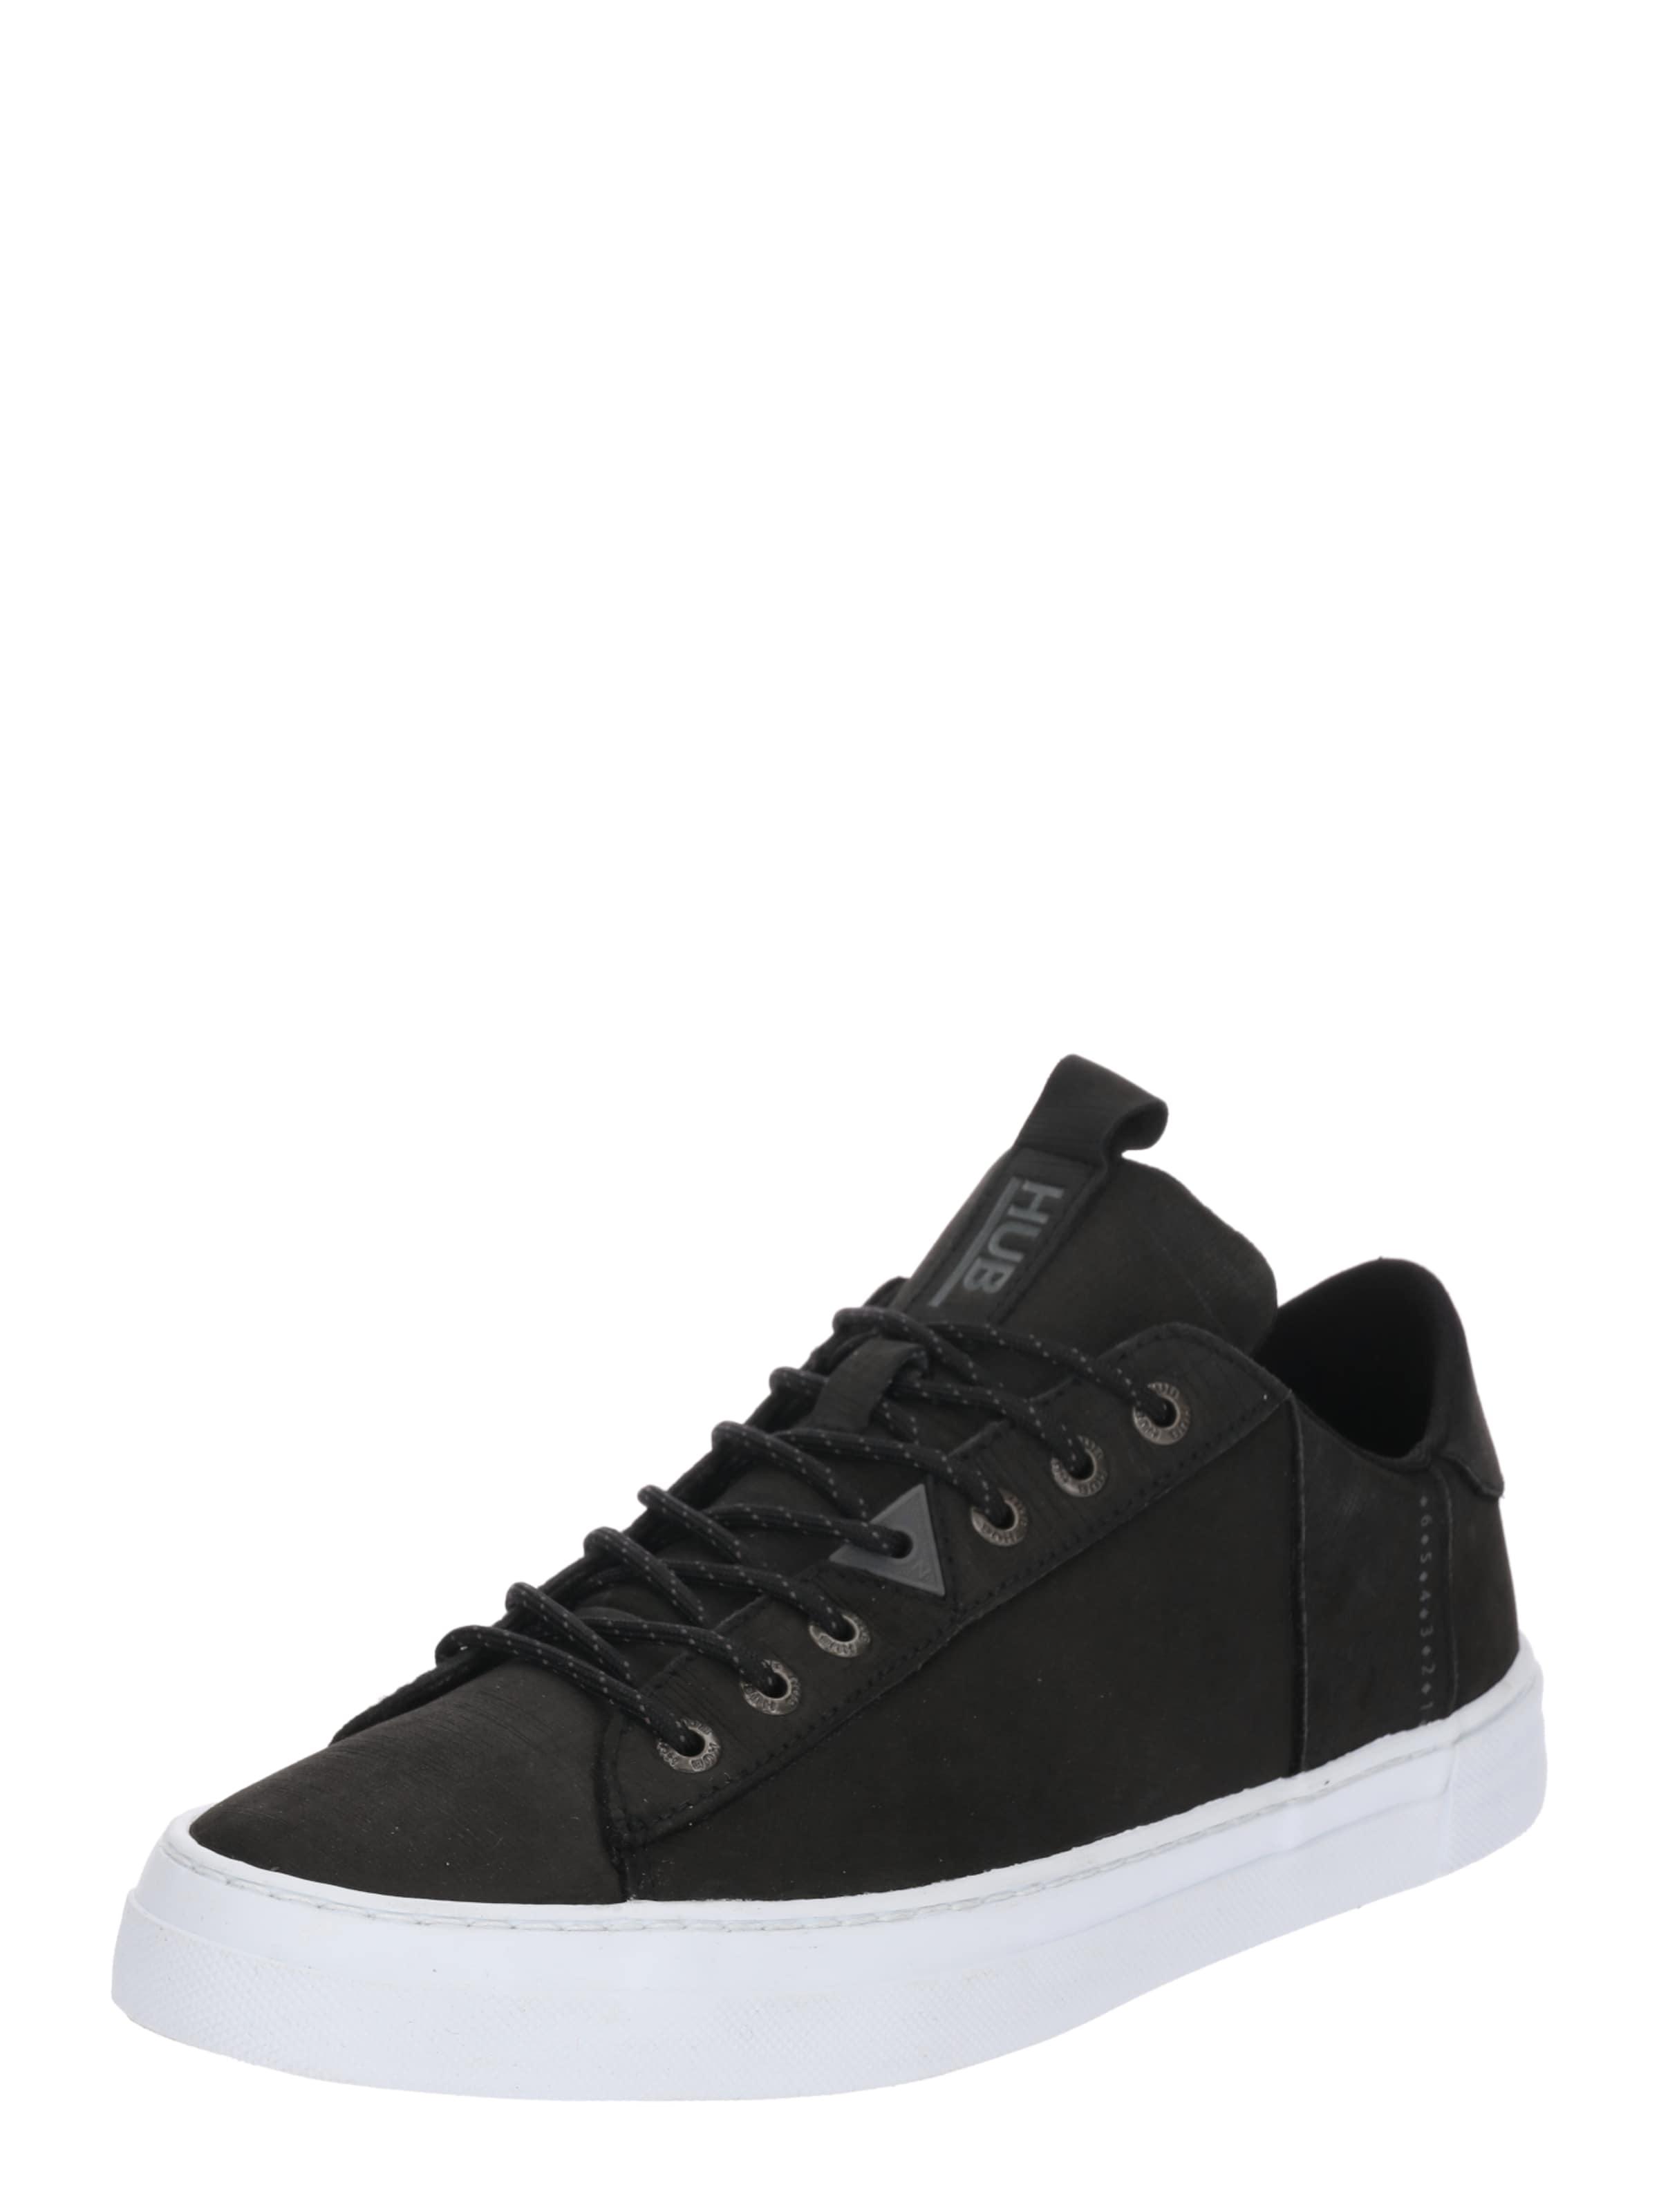 HUB Sneaker Low Hook Verschleißfeste billige Schuhe